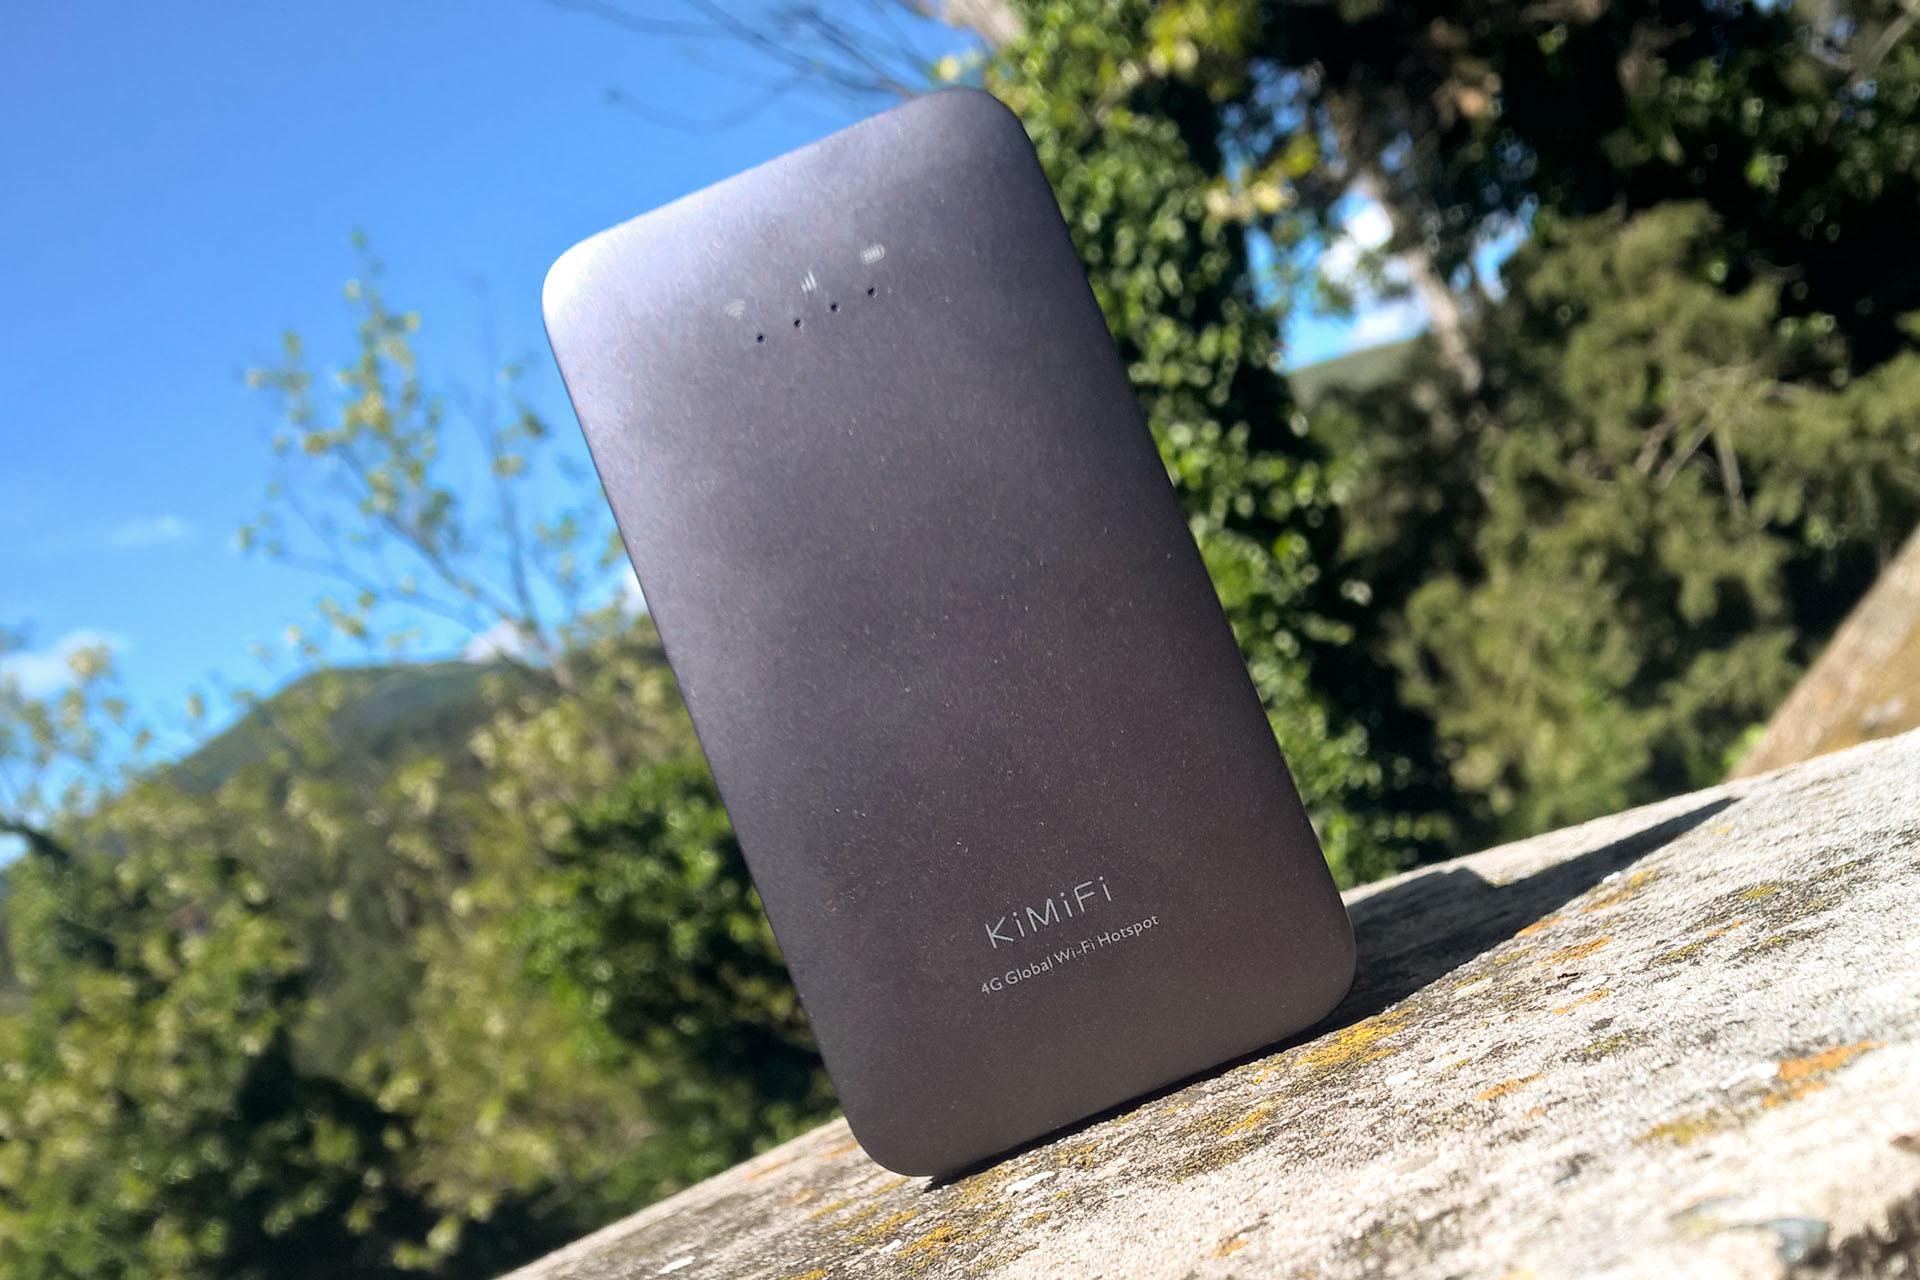 Unboxing saponetta Wi-Fi KiMiFi